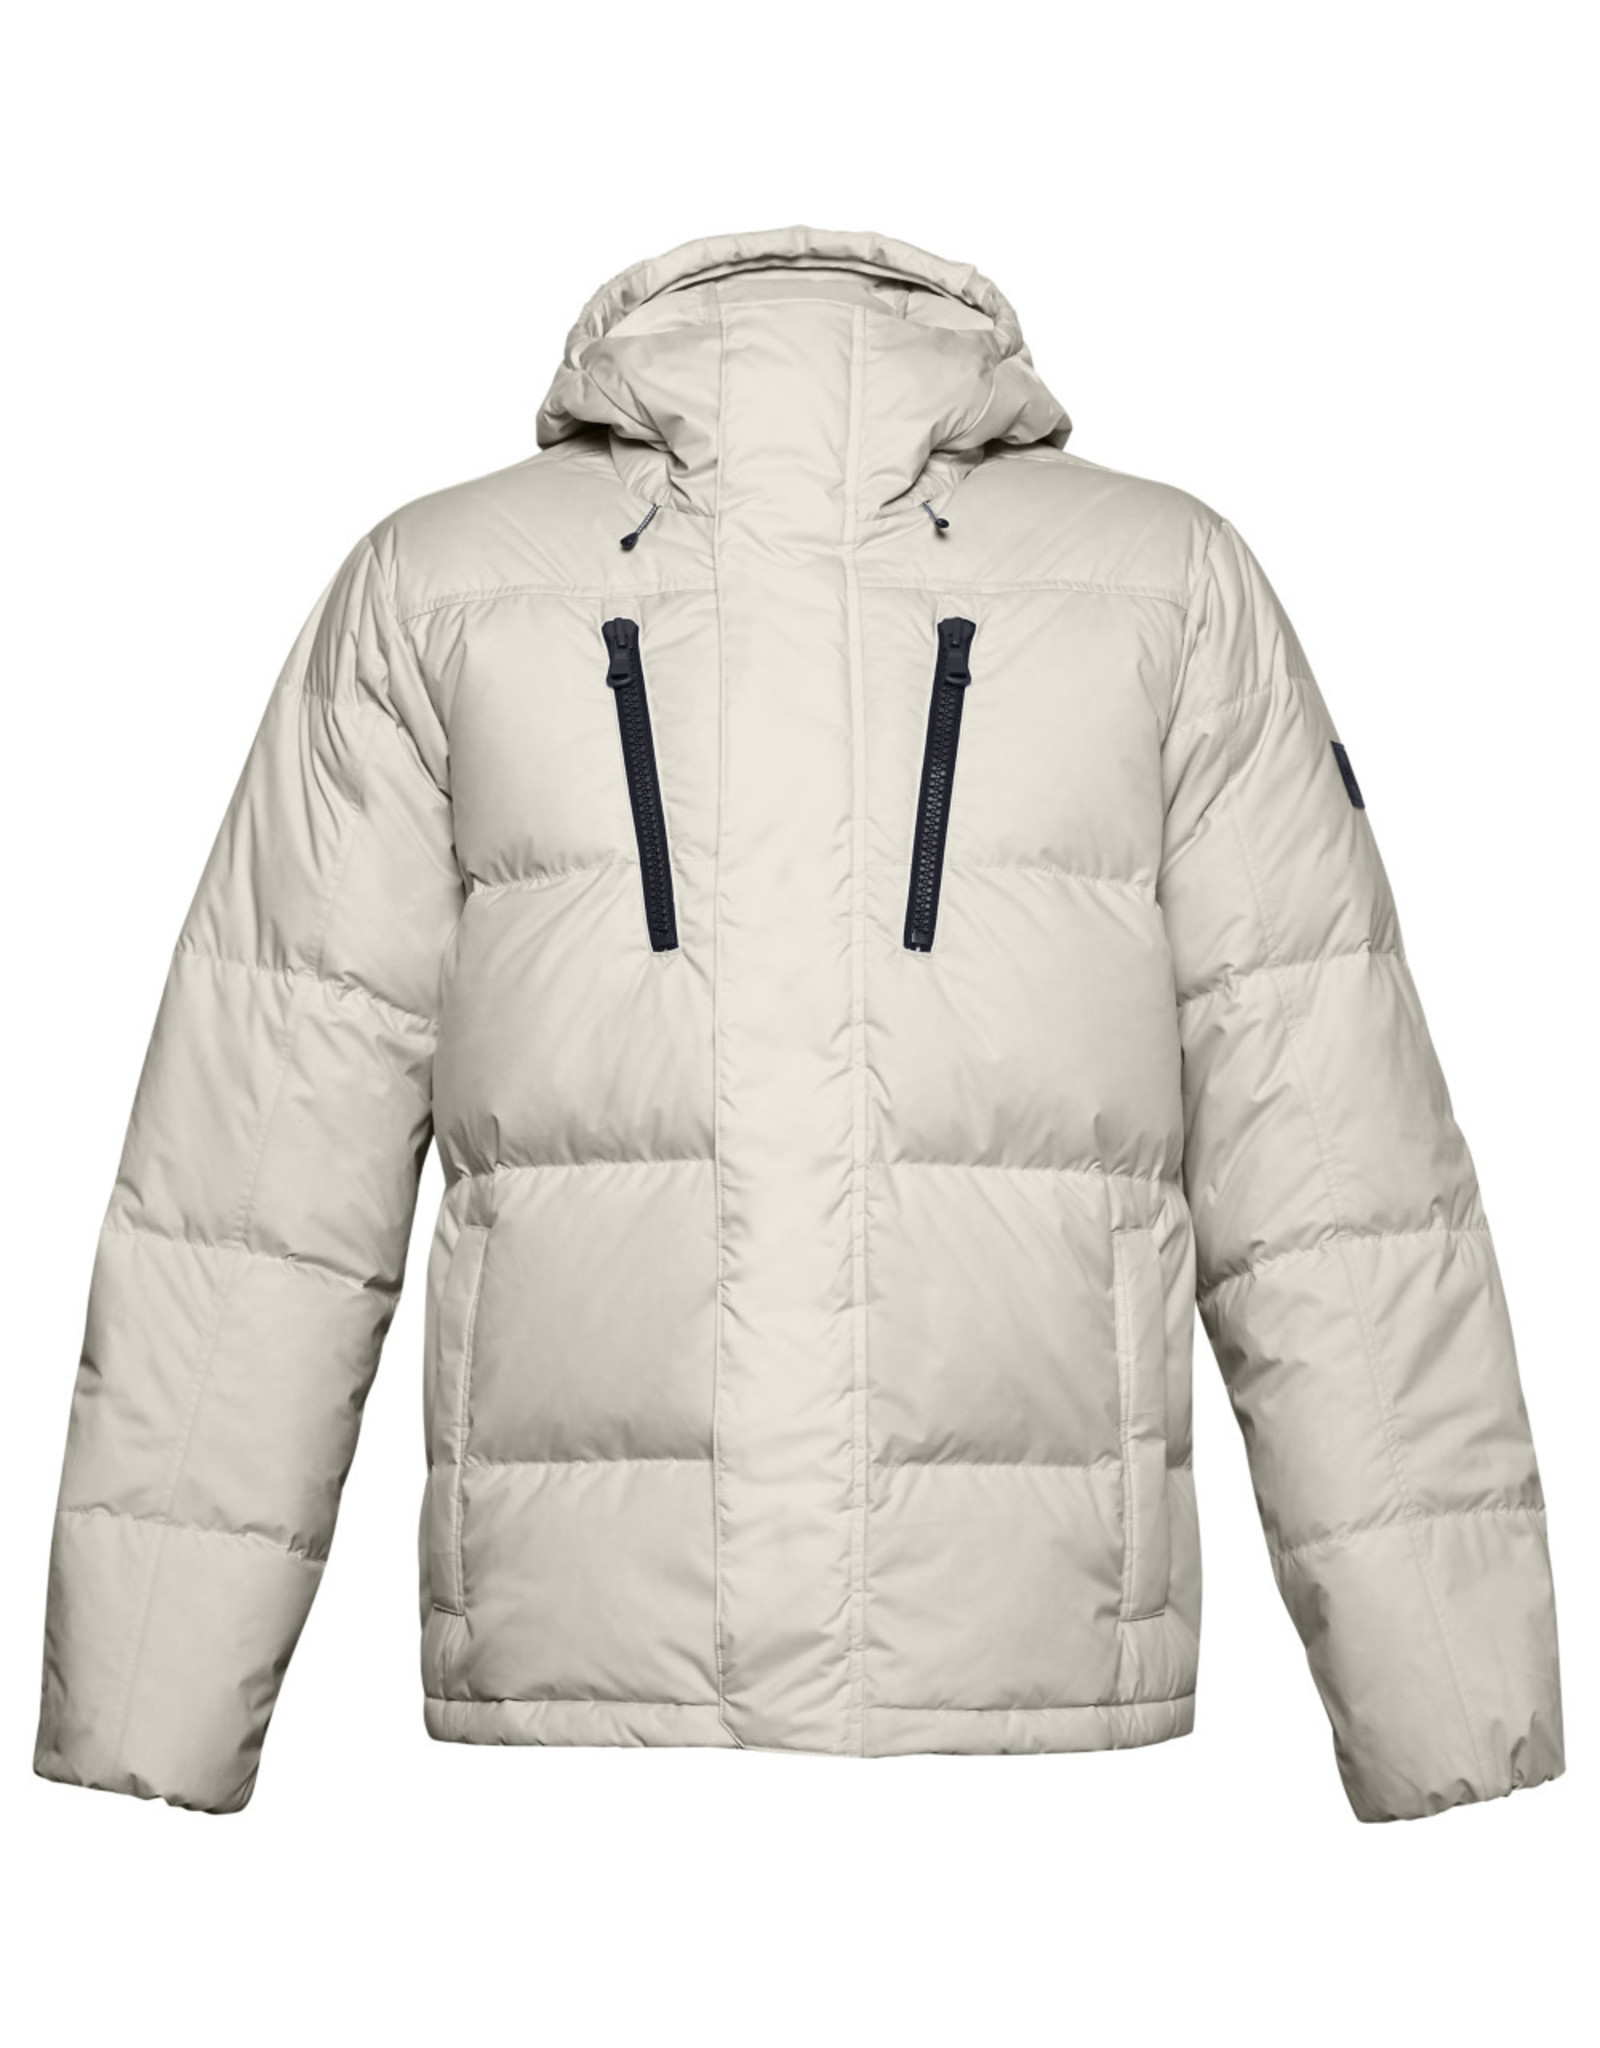 Under Armour UA Sportstyle Down Jacket - White